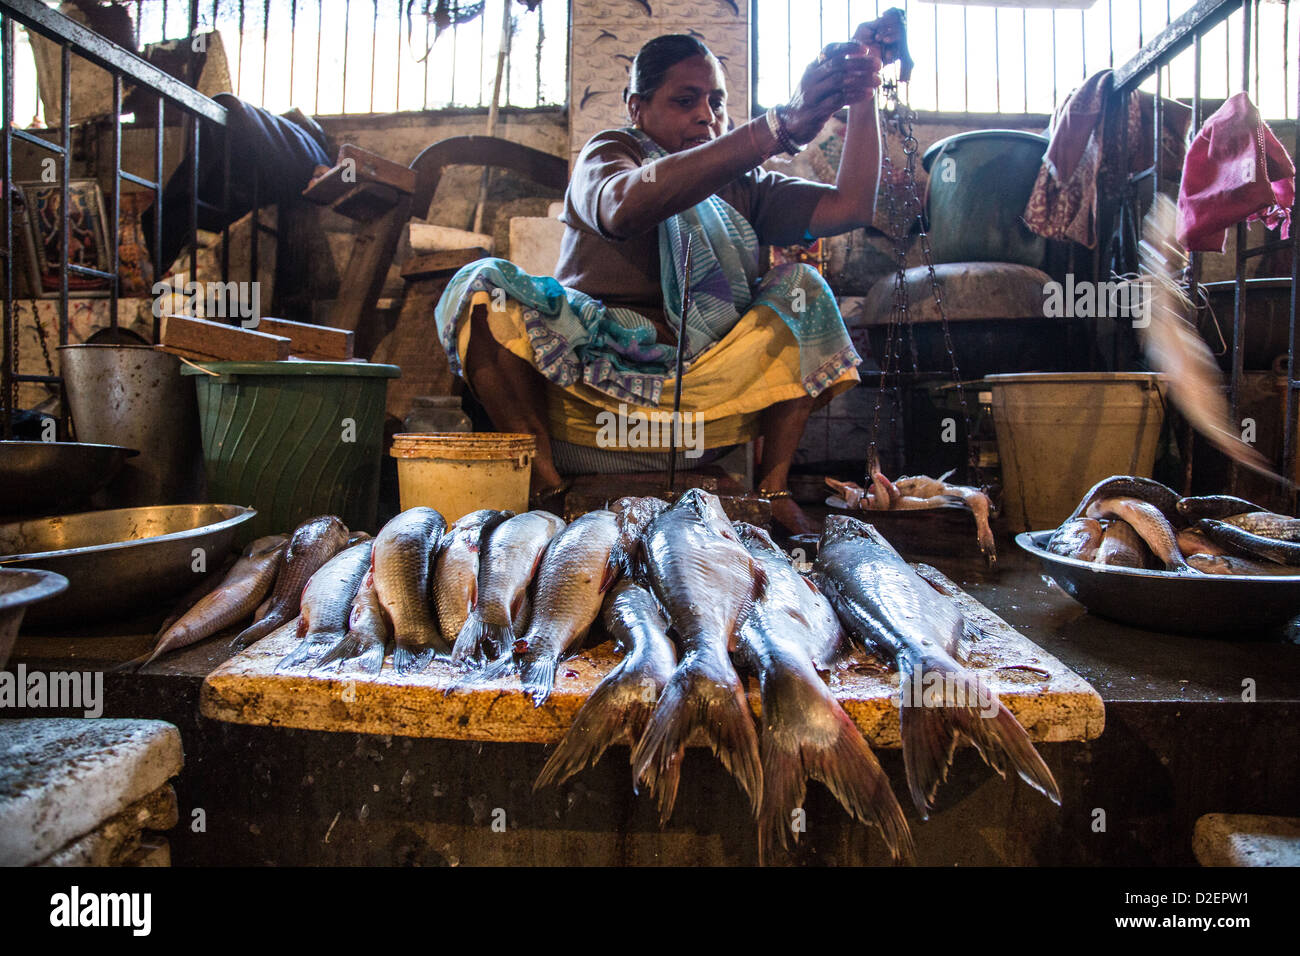 Fish market in Ahmedabad, Gujarat, India - Stock Image